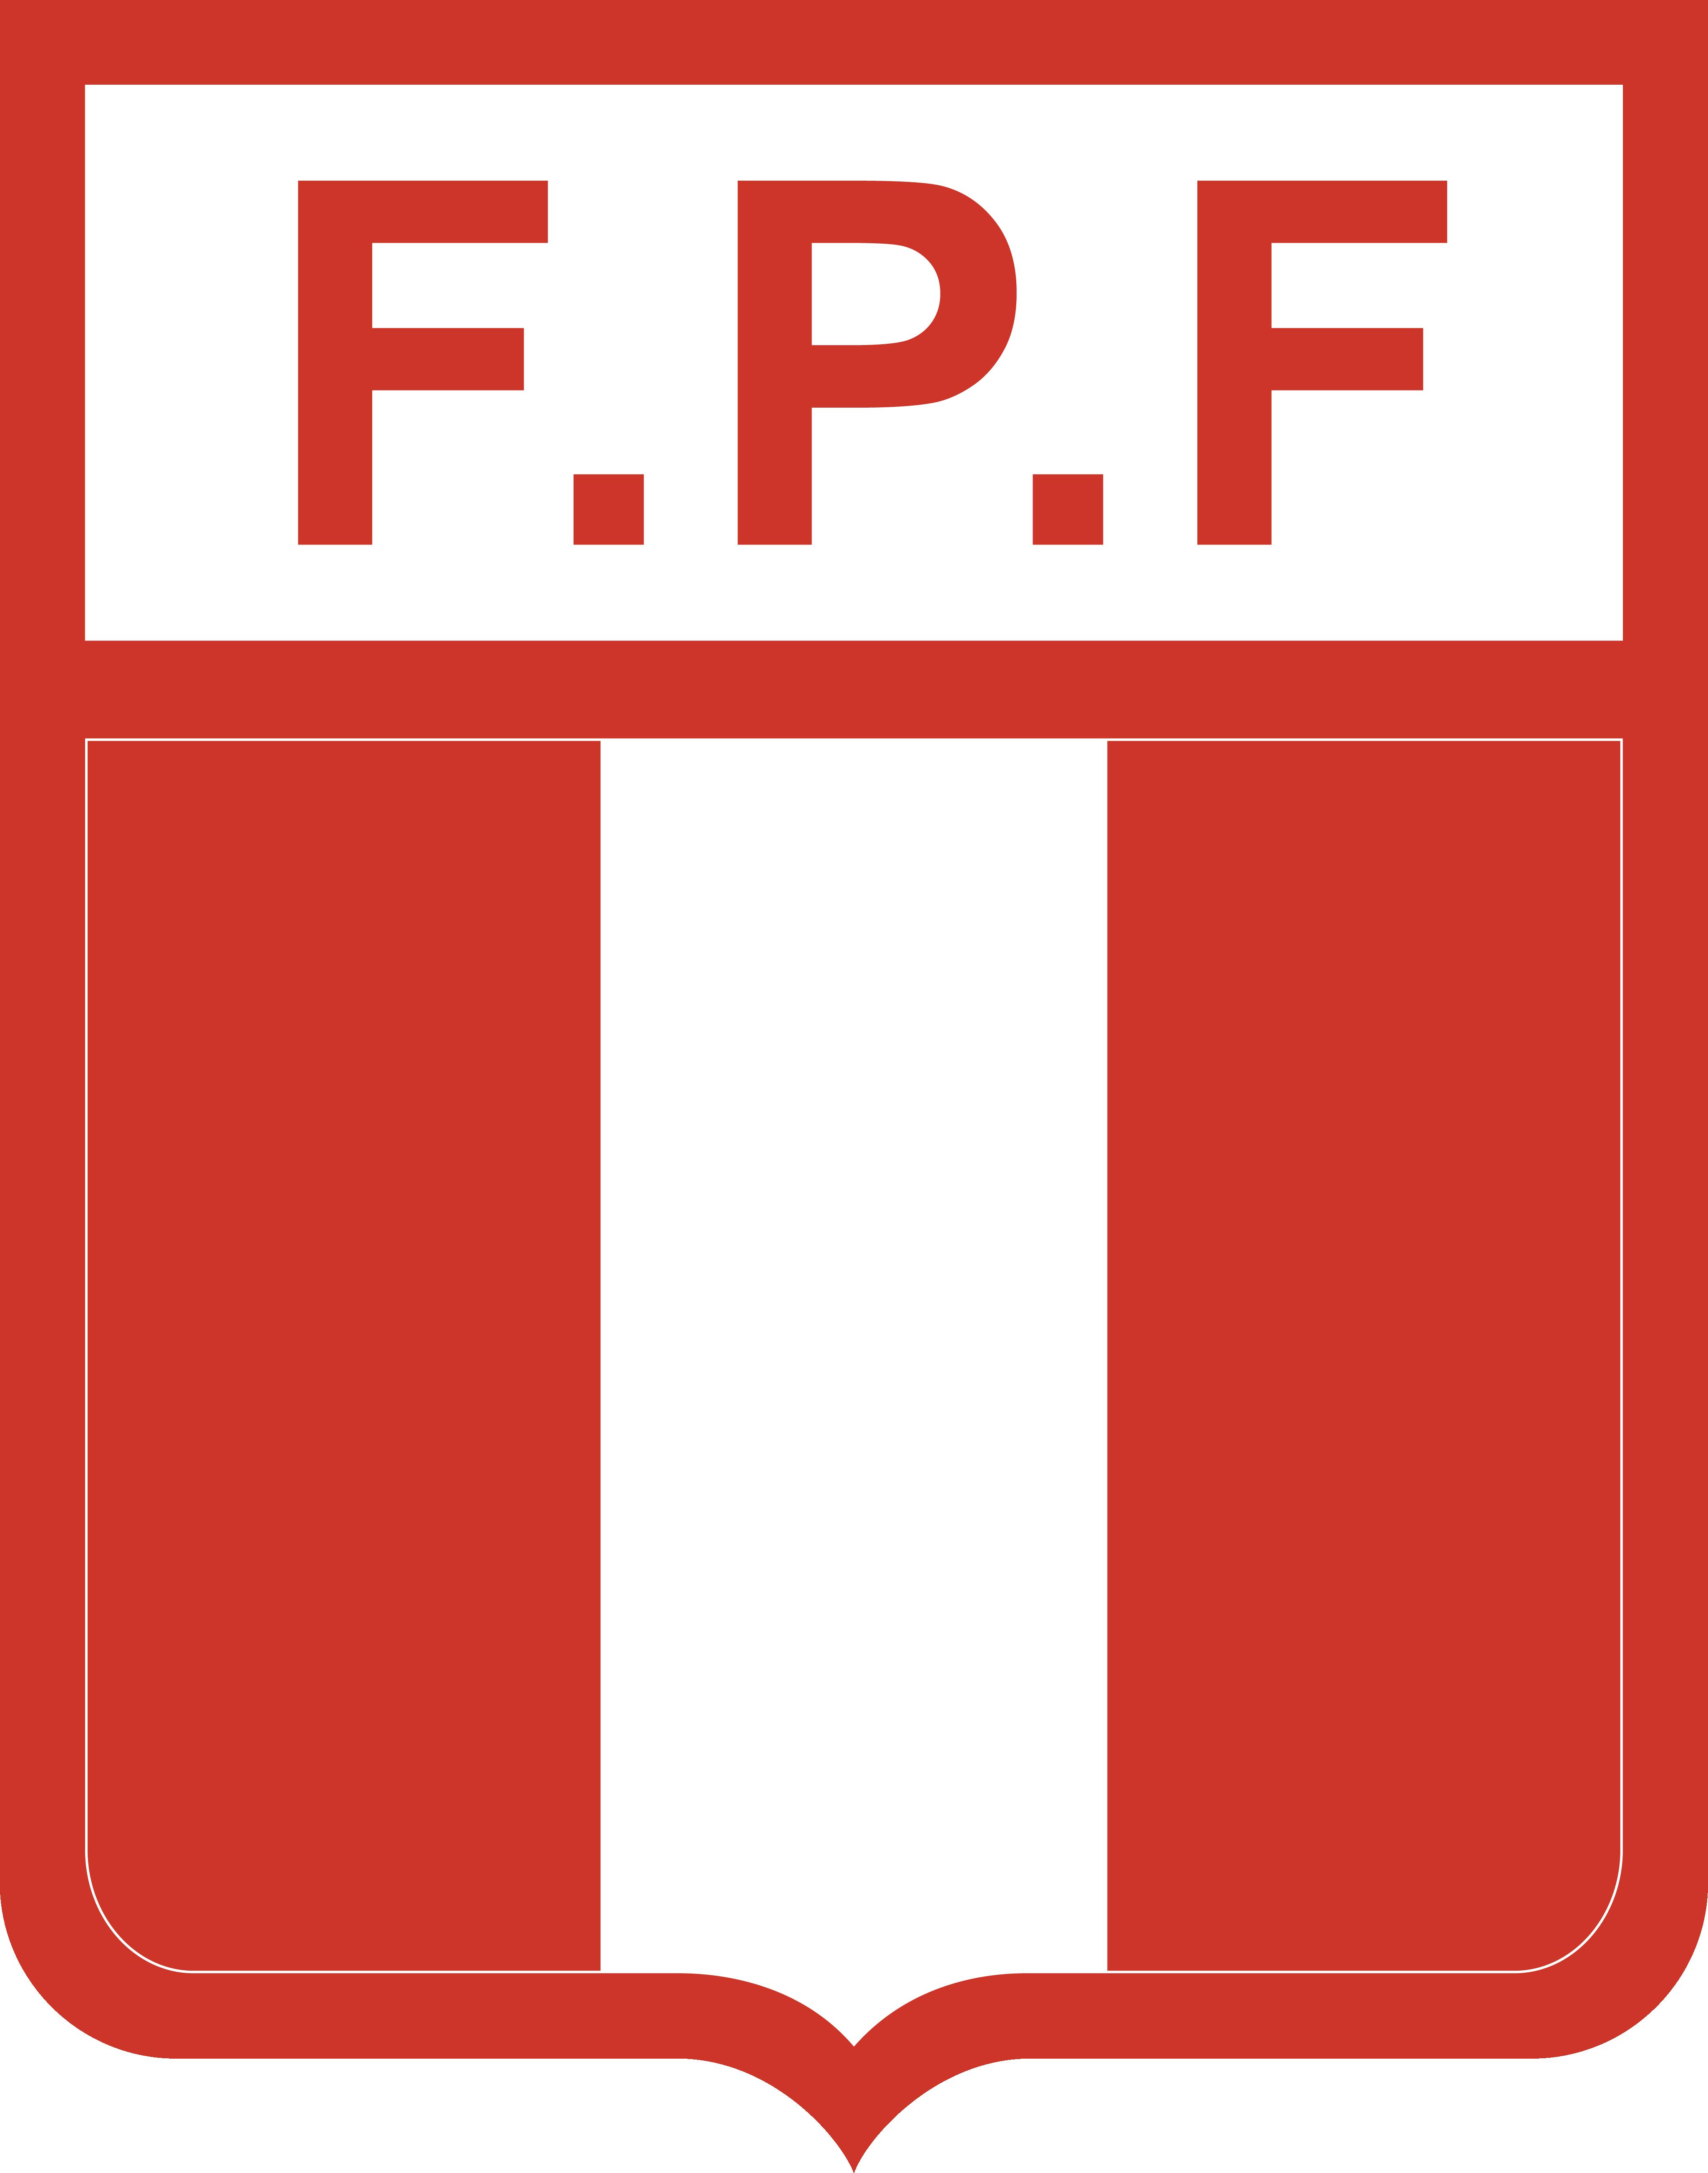 Perú fútbol